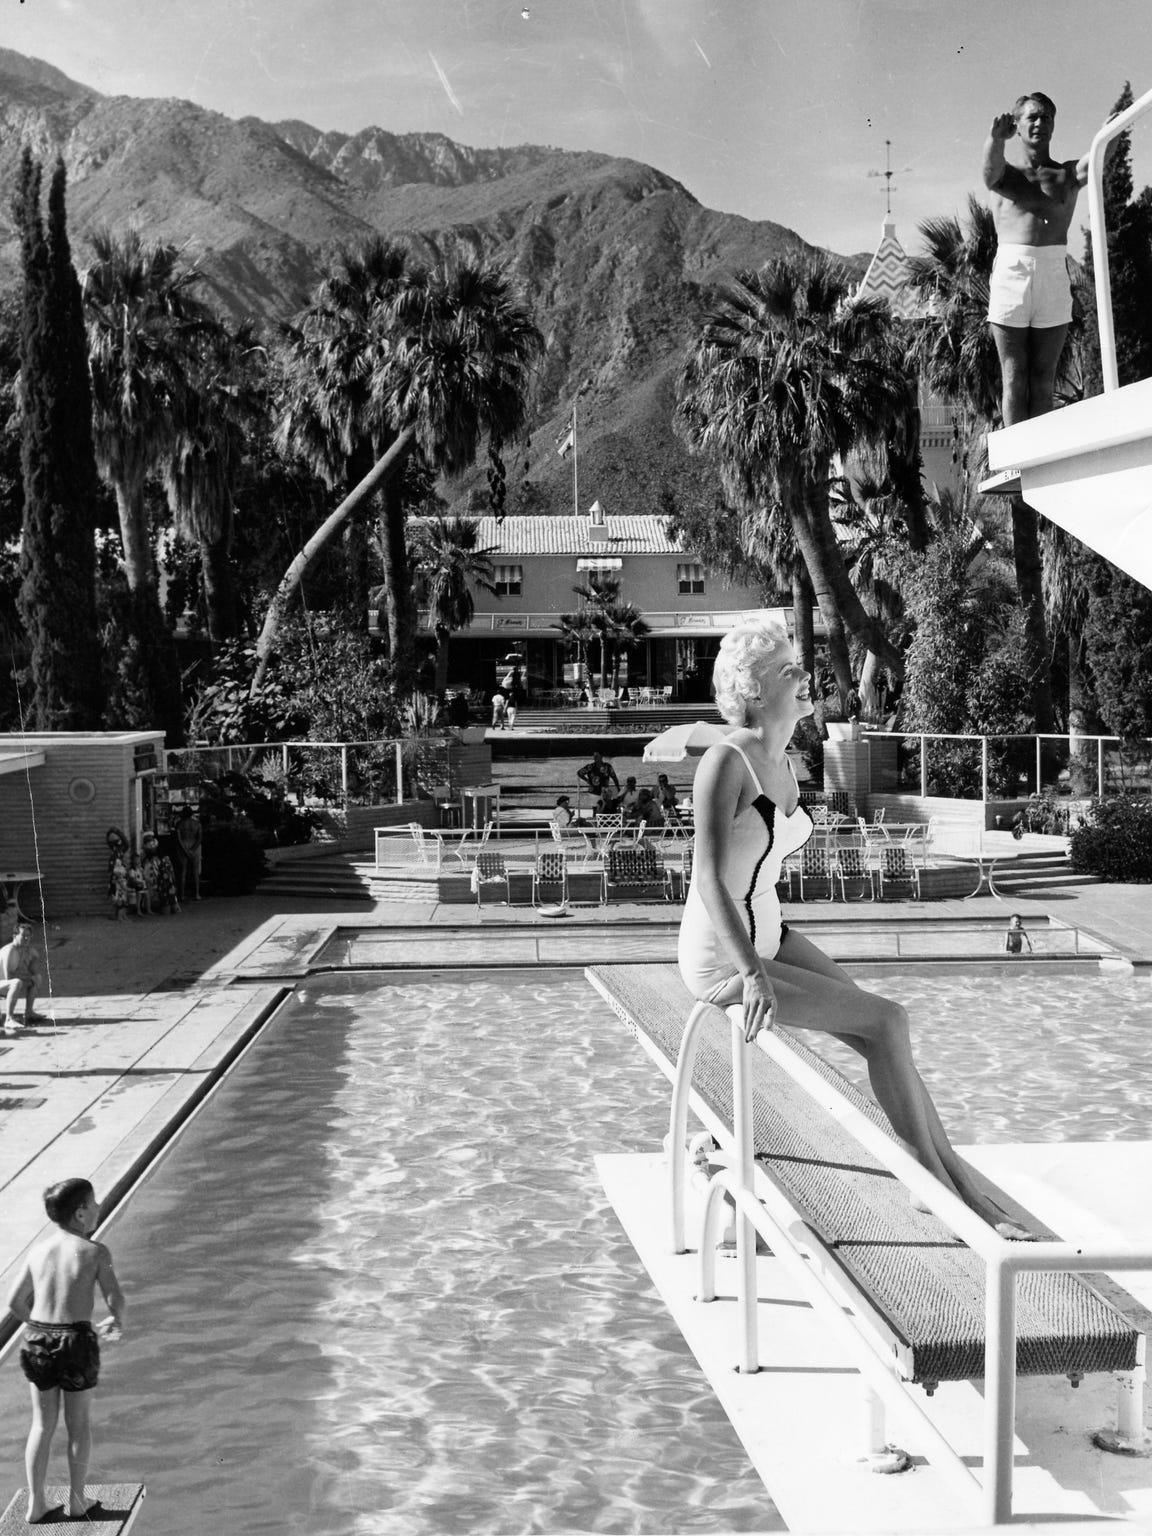 El Mirador swimming pool.